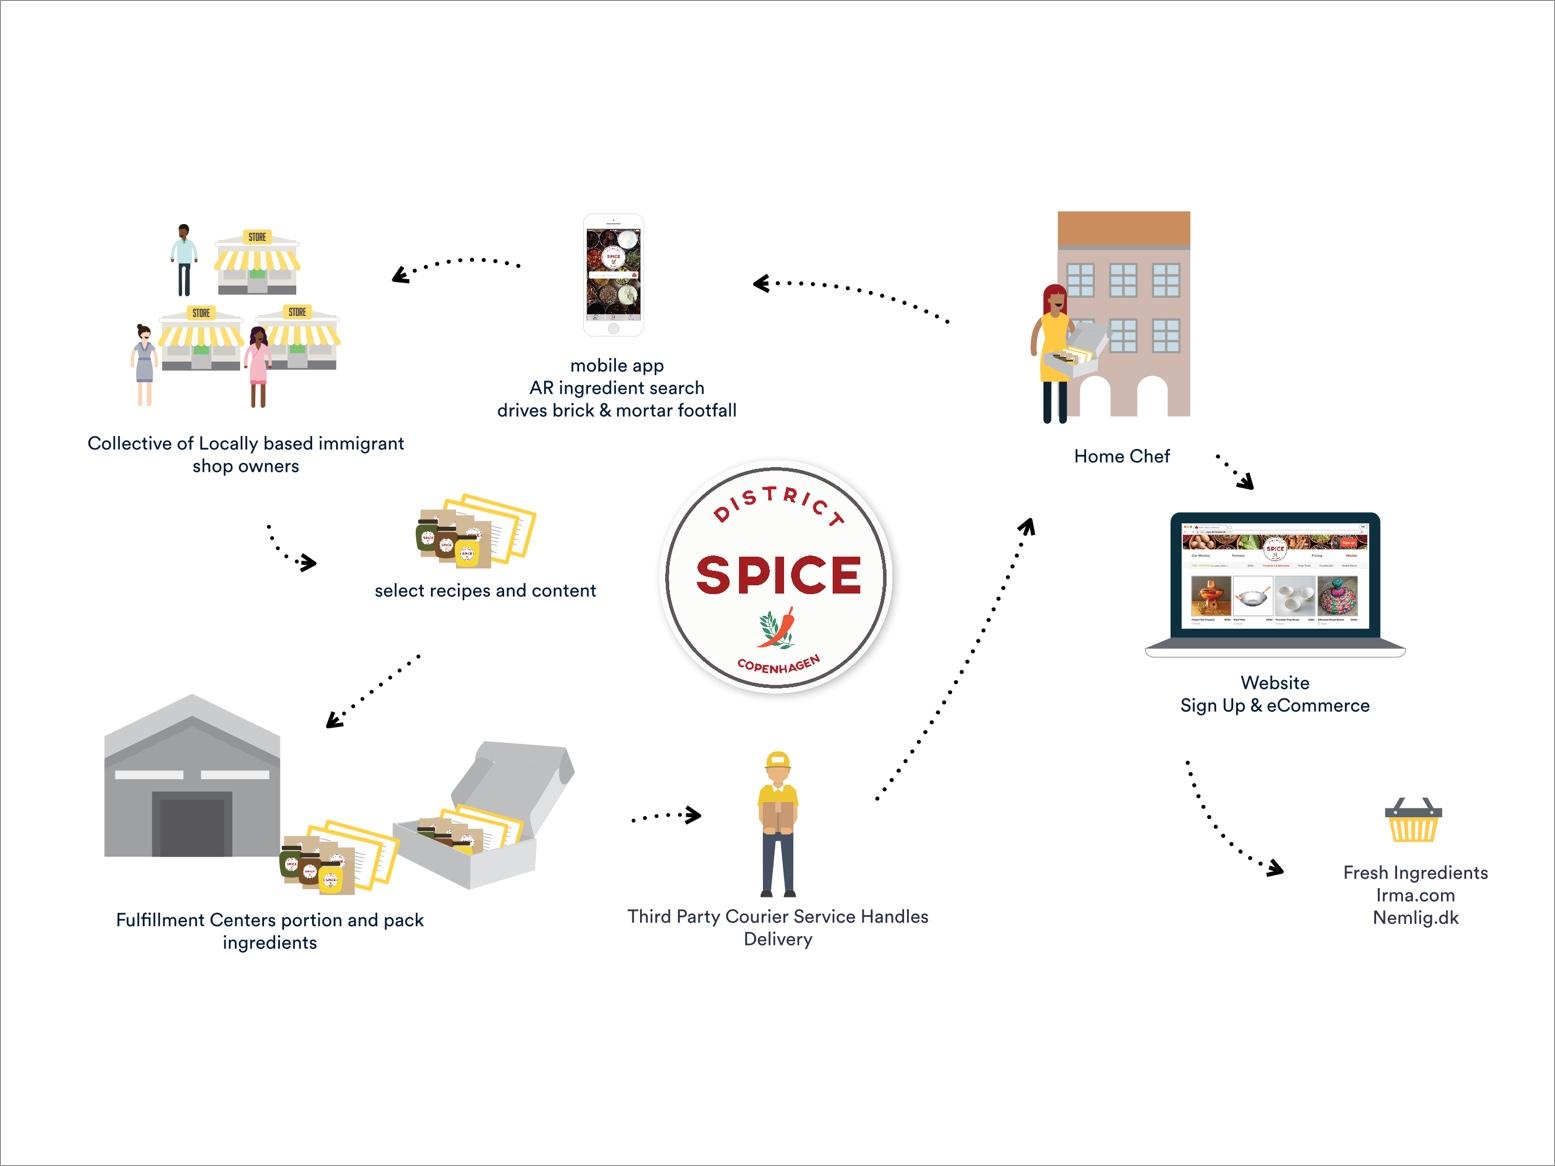 District Spice Concept Sketch